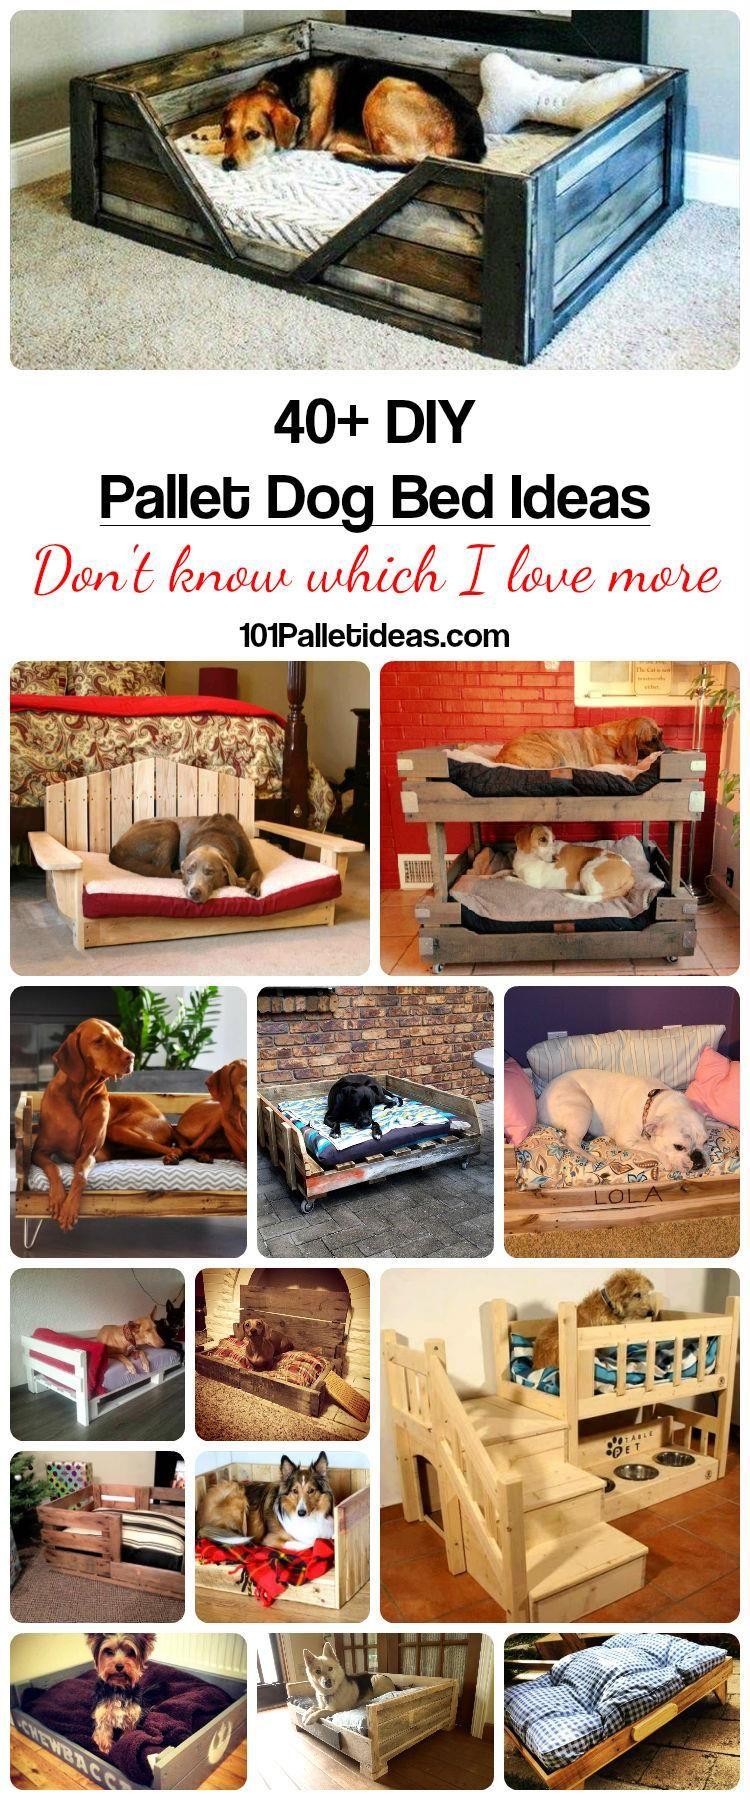 Pallet Dog Bed Diy Pallet Projects Hunde Bett Hunde Hundebett